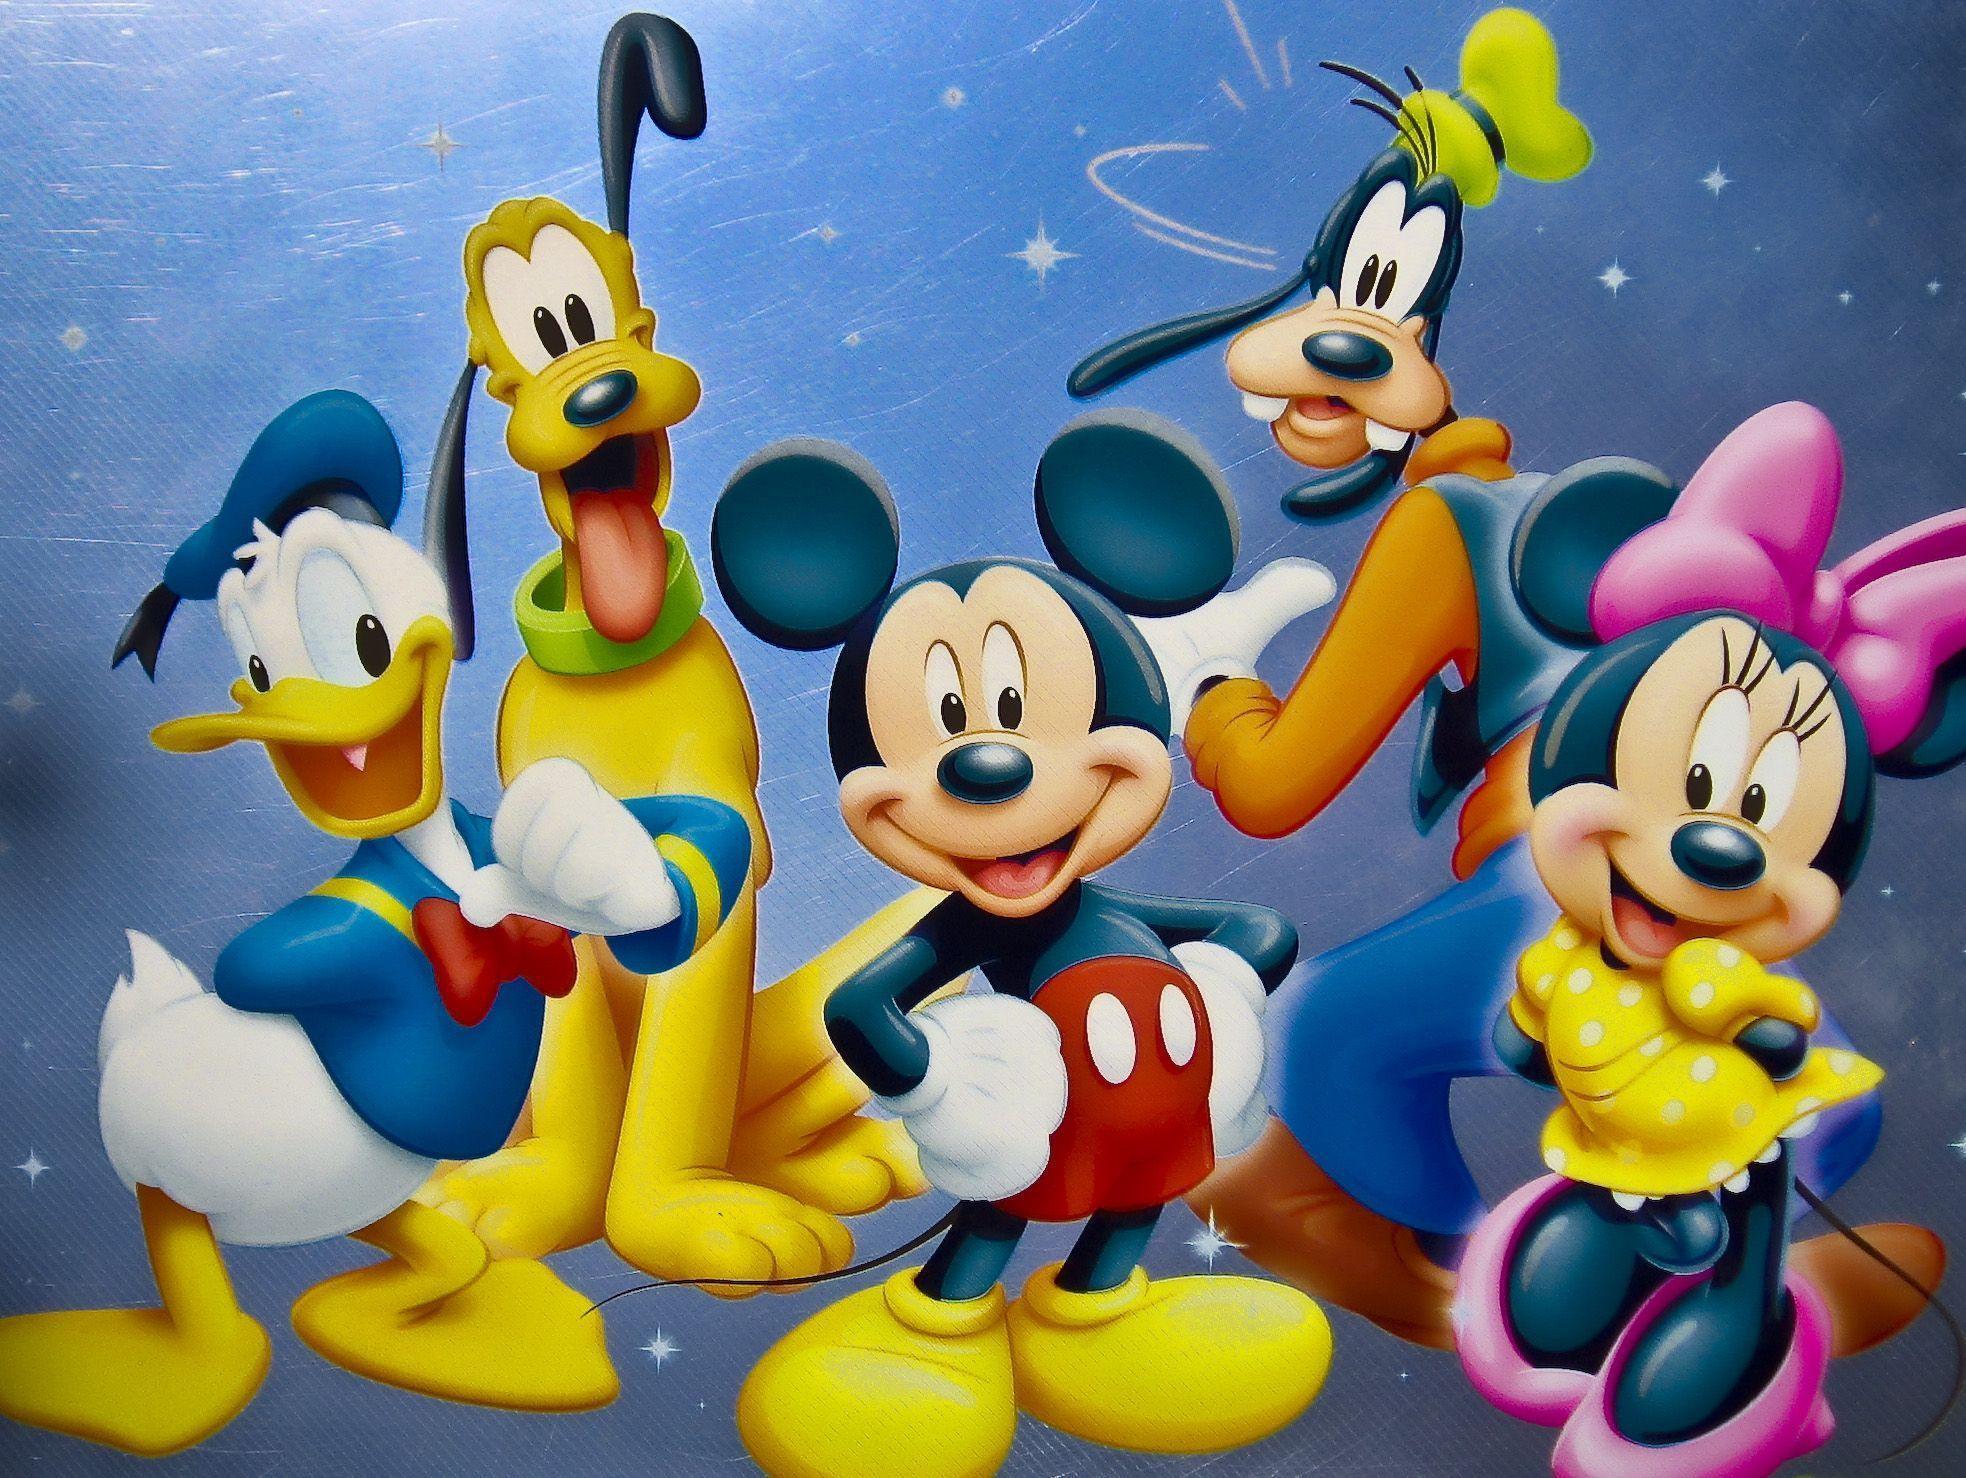 Hi 5 Cartoon Characters : Disney characters wallpapers wallpaper cave